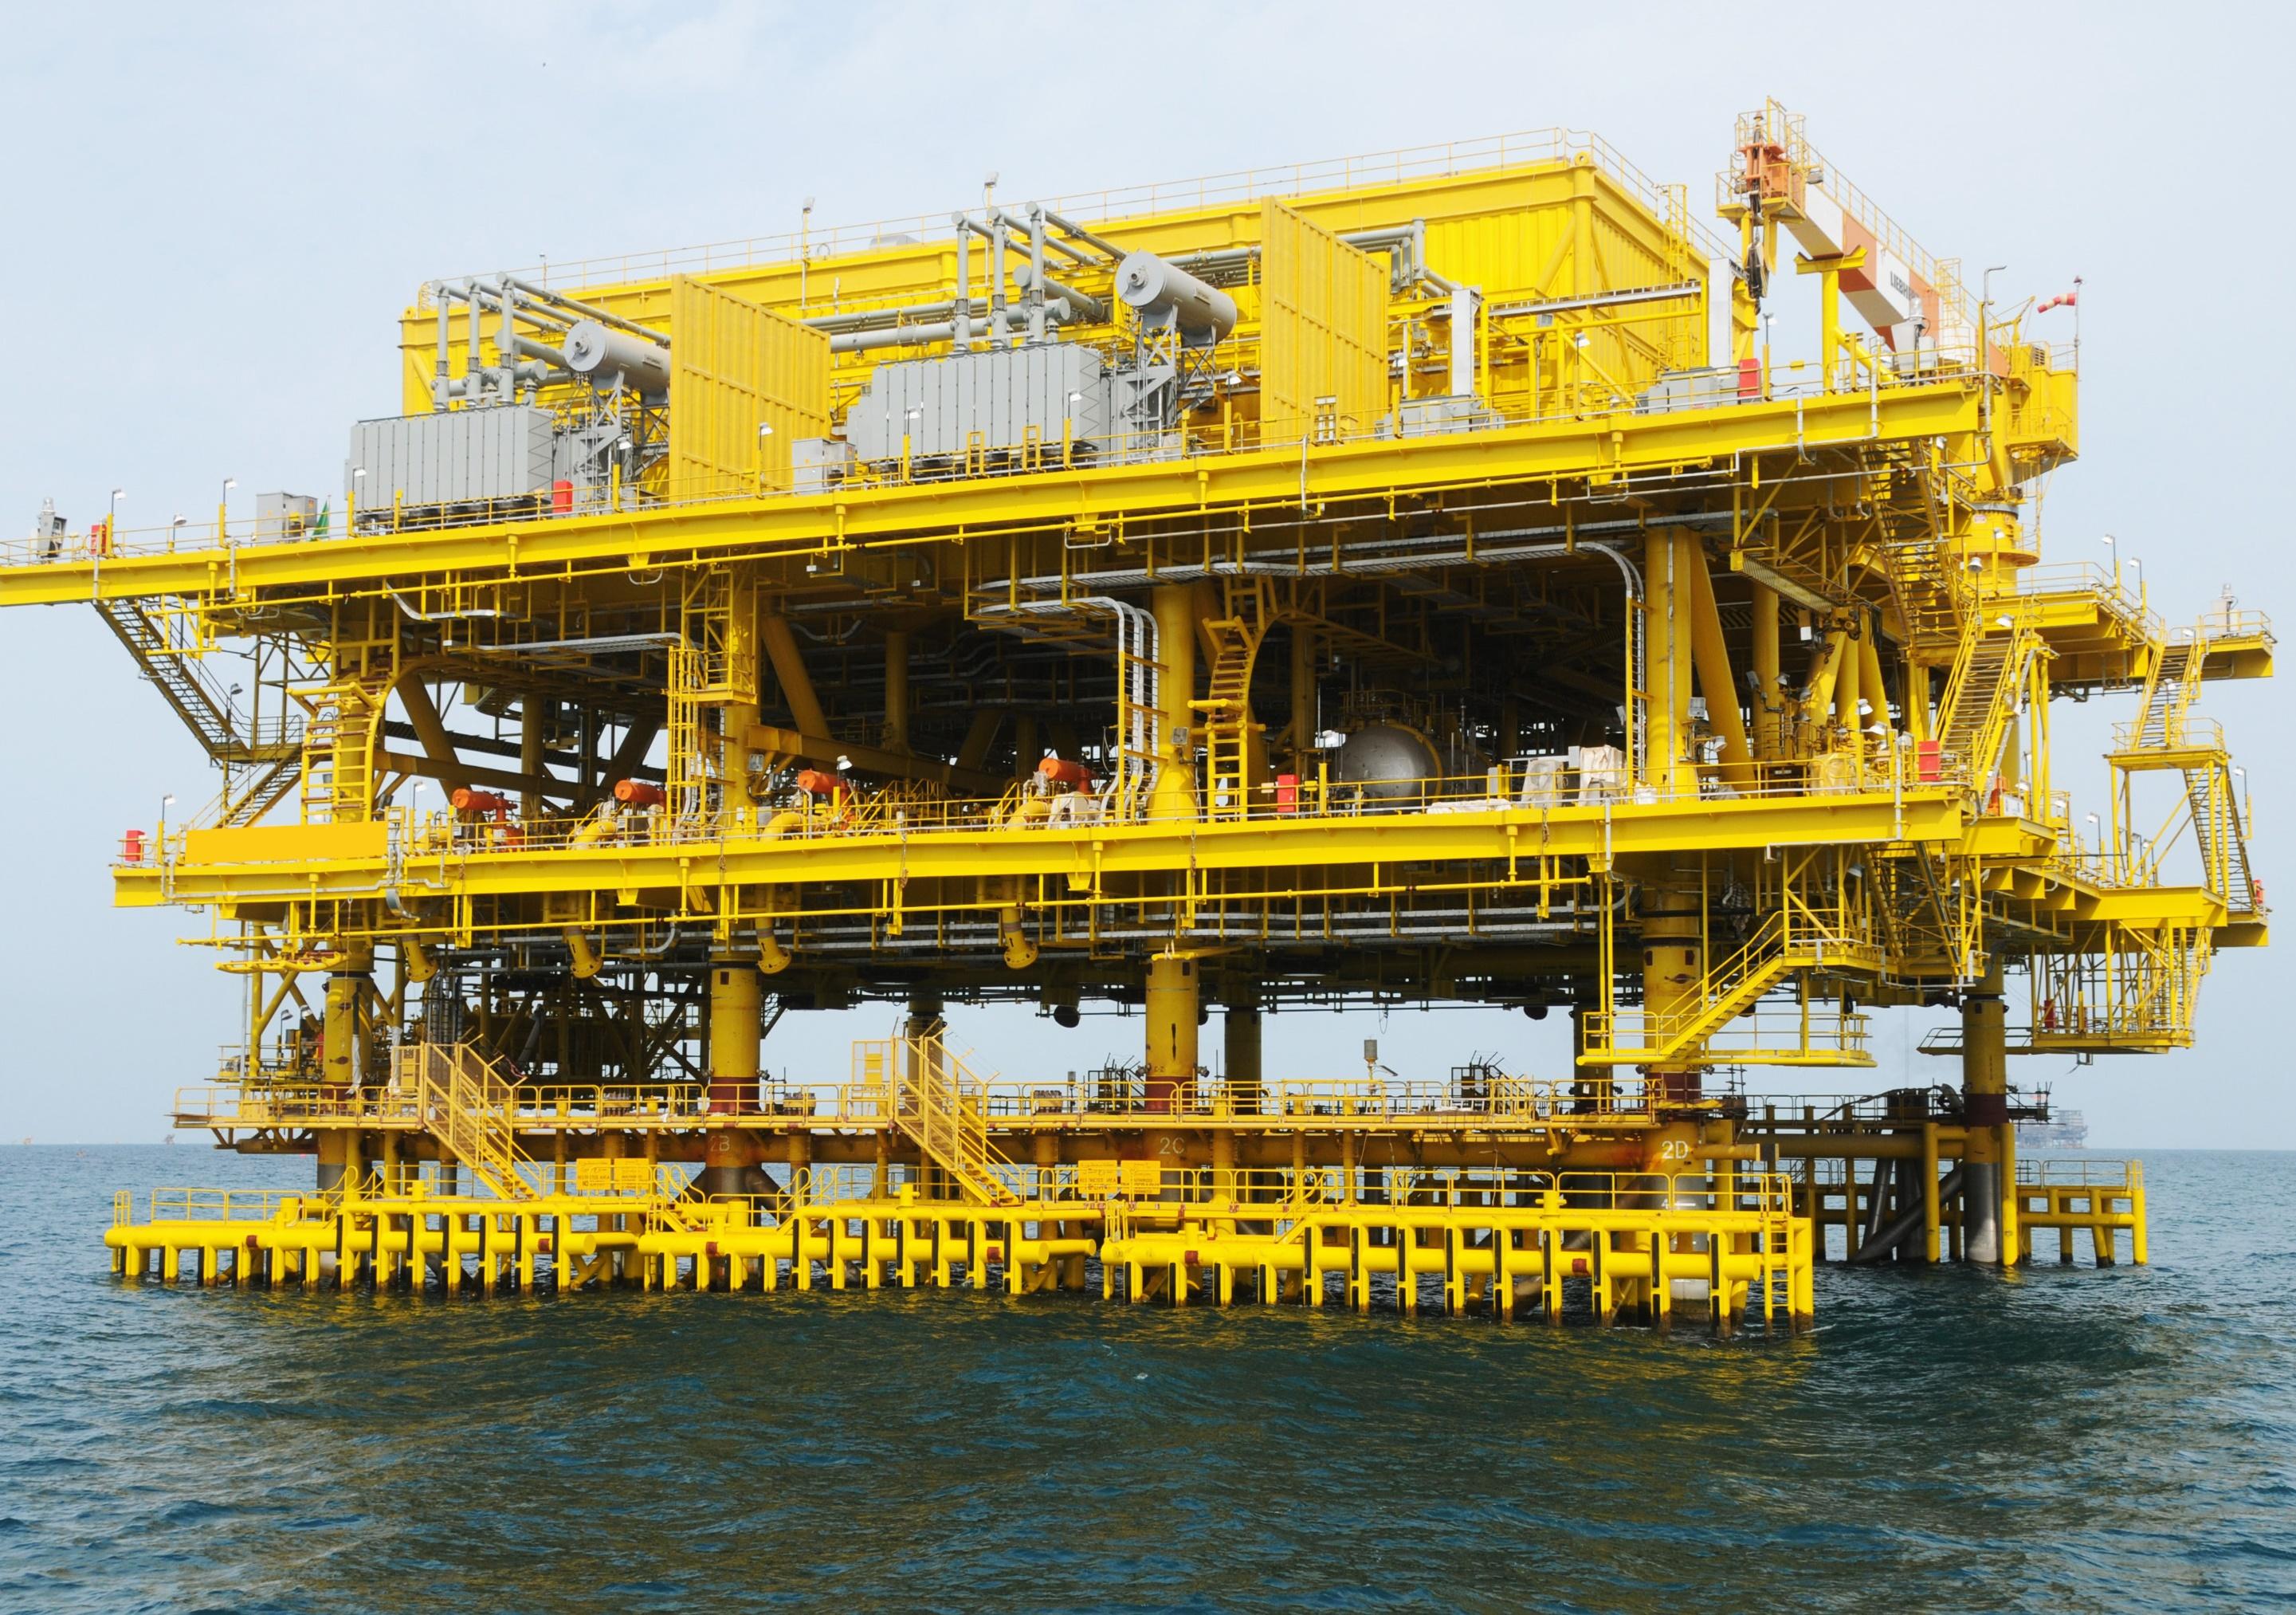 Saudi Aramco awards offshore EPCI contract to McDermott